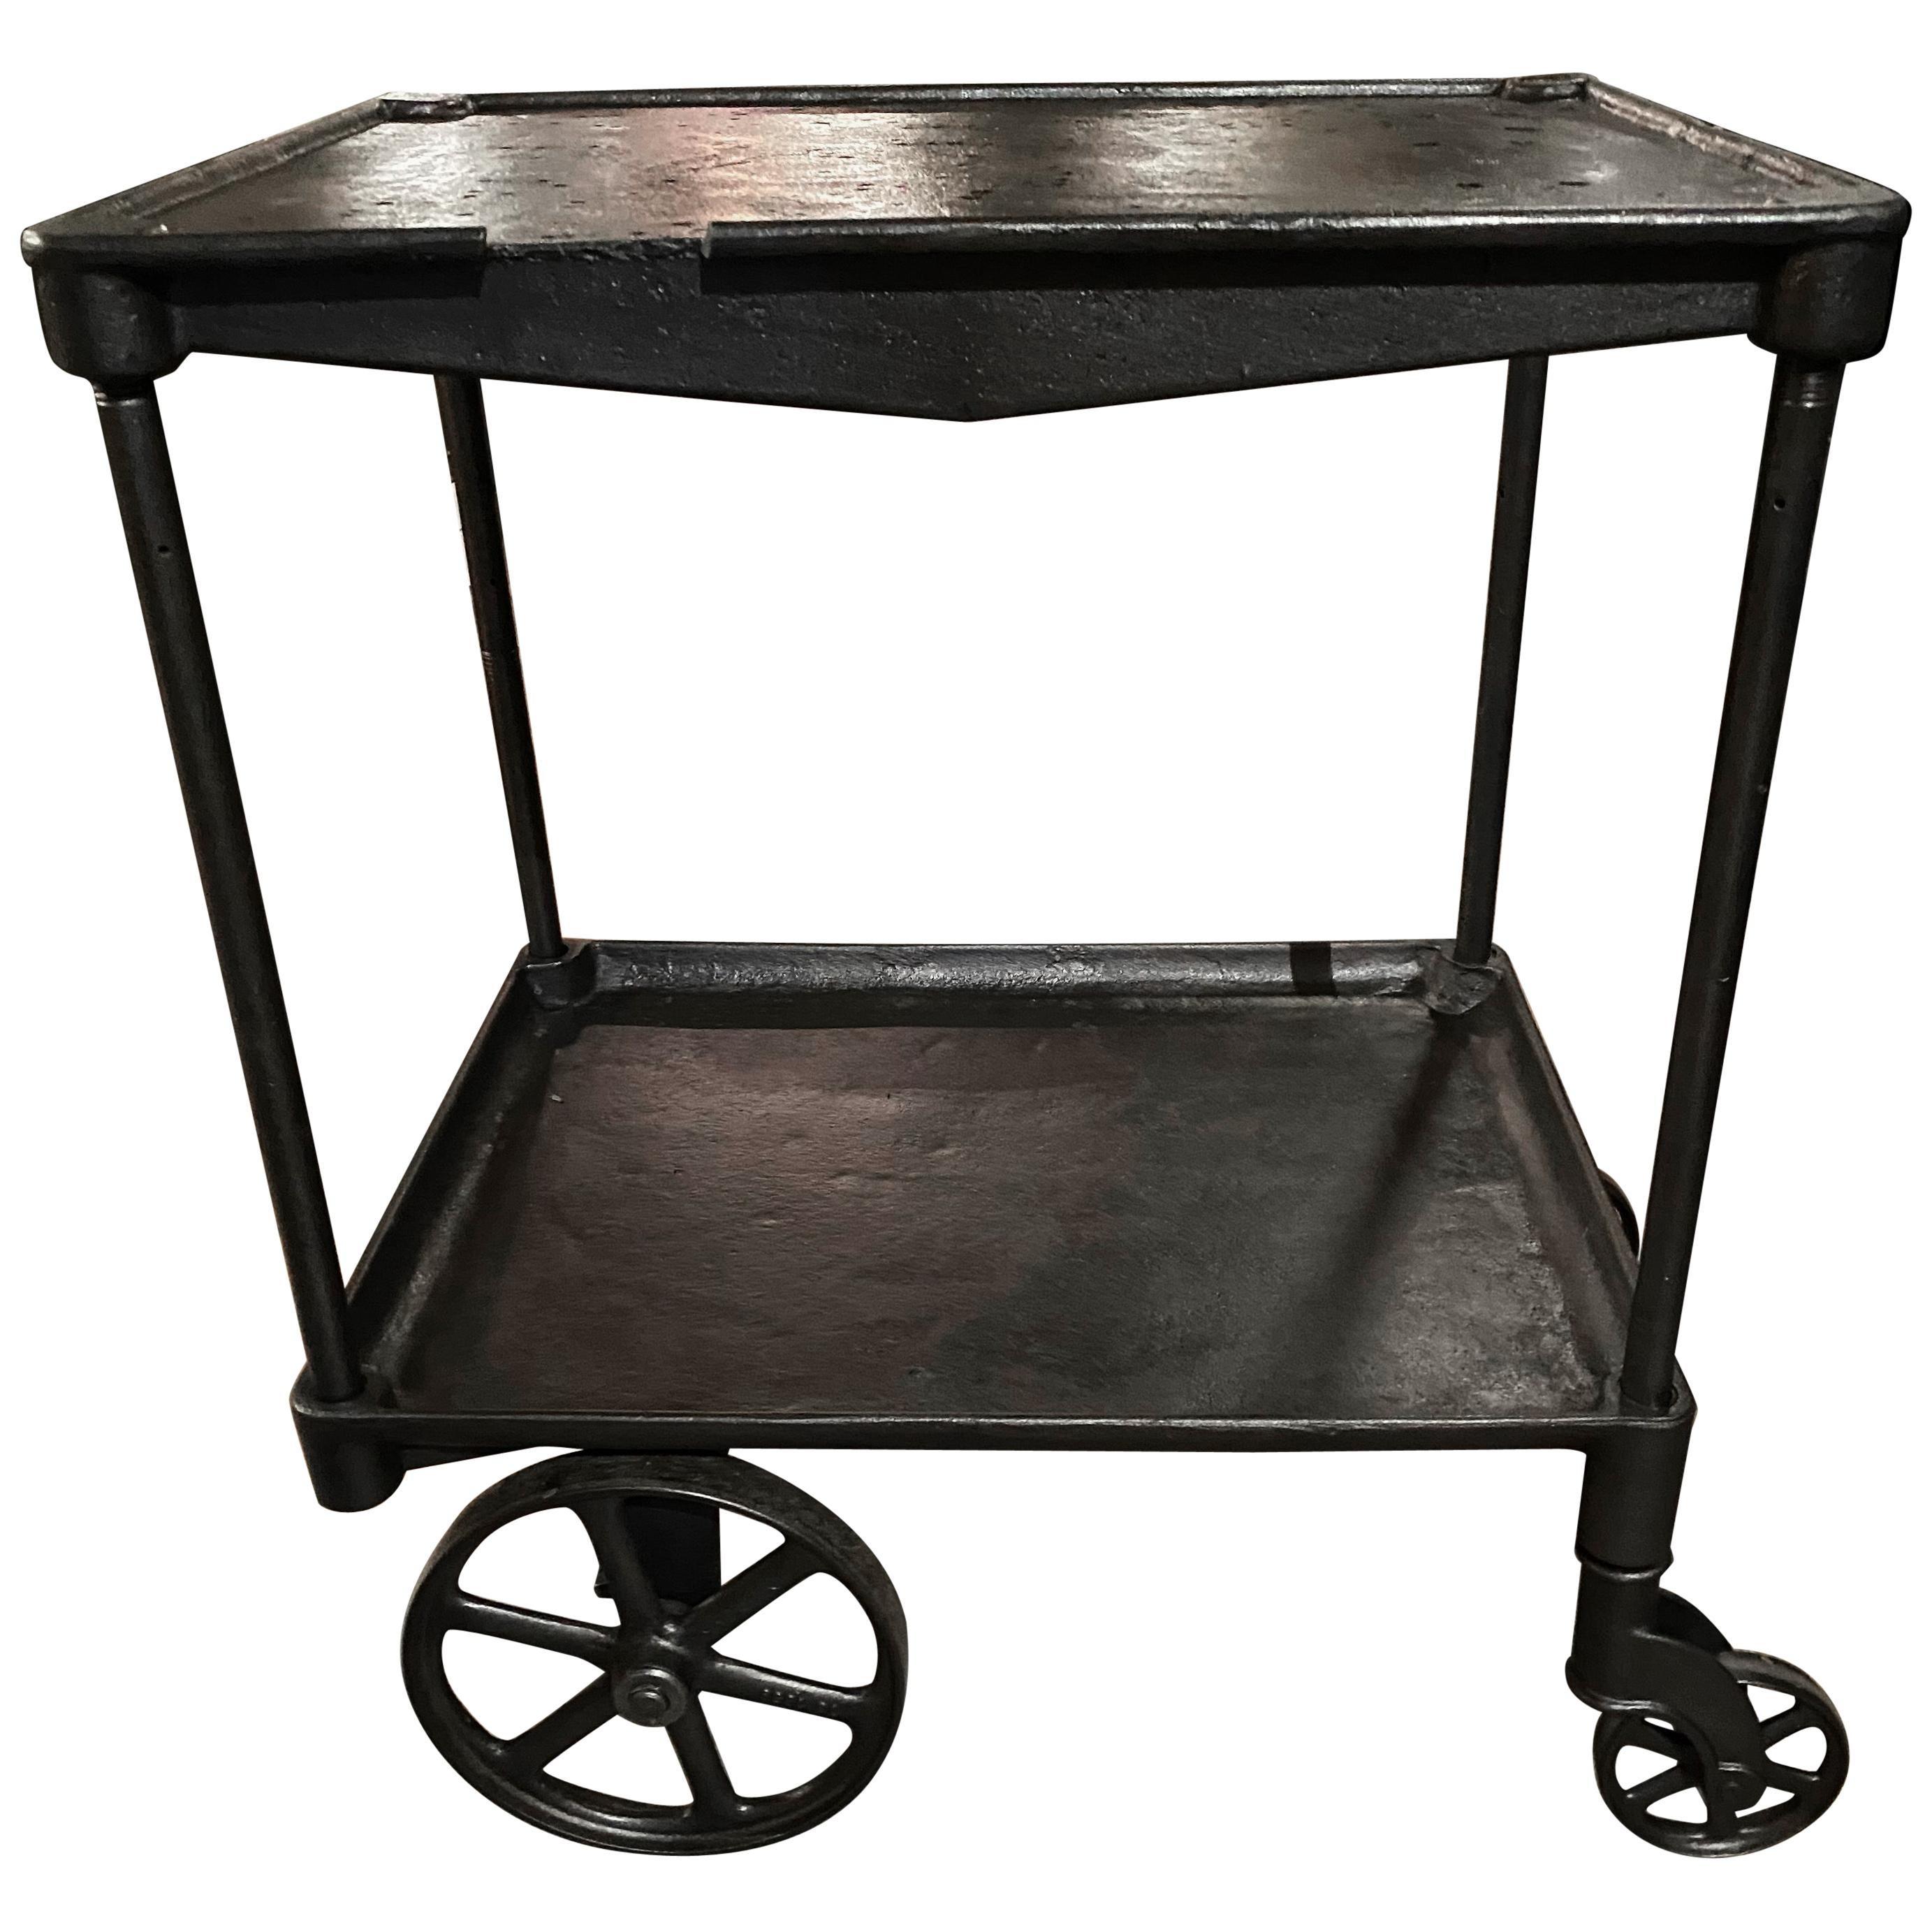 Vintage Industrial Machinist's Cart / Bar Cart